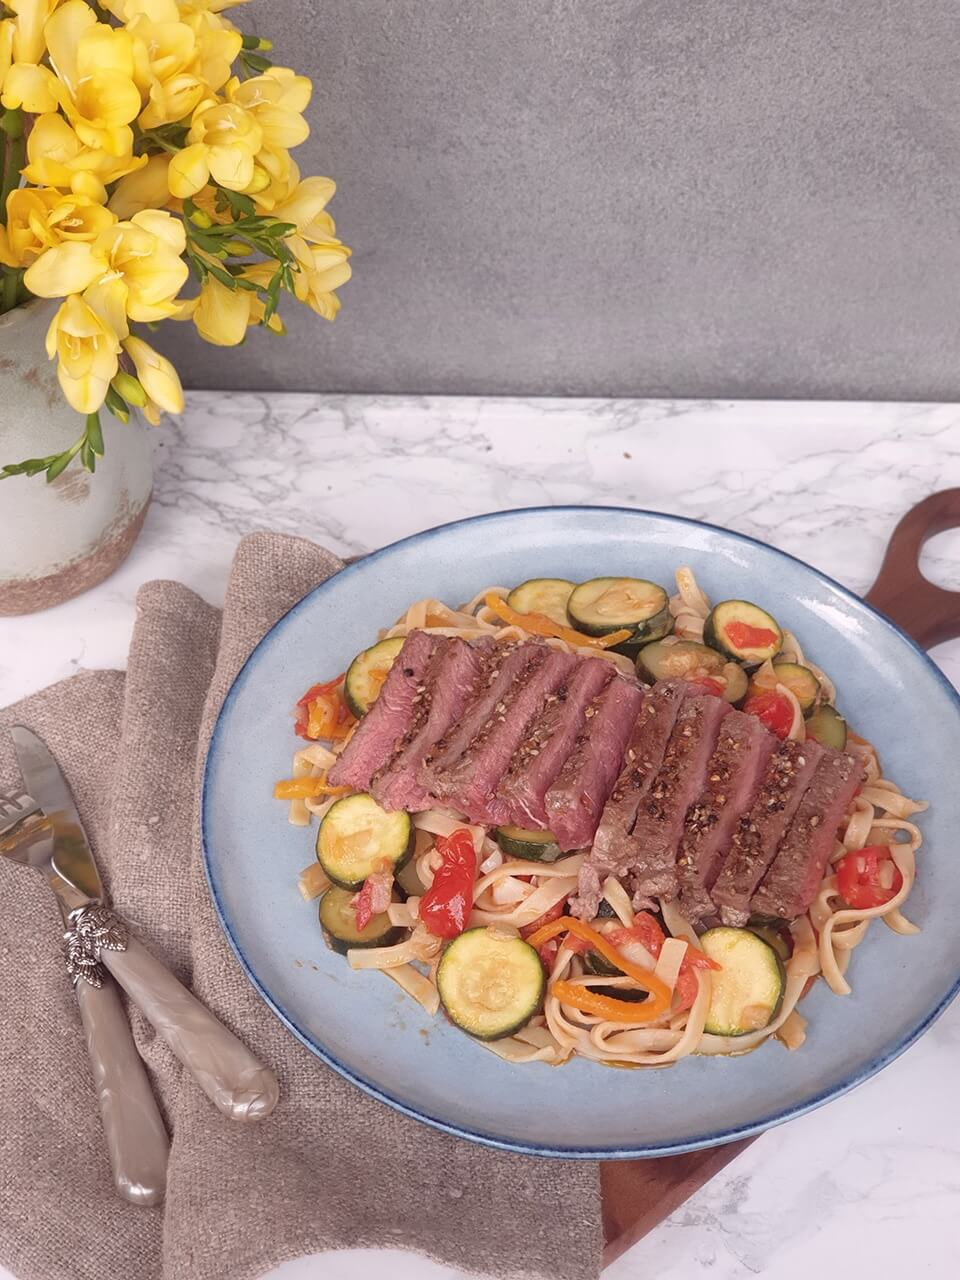 Beef steak s tagliatelle